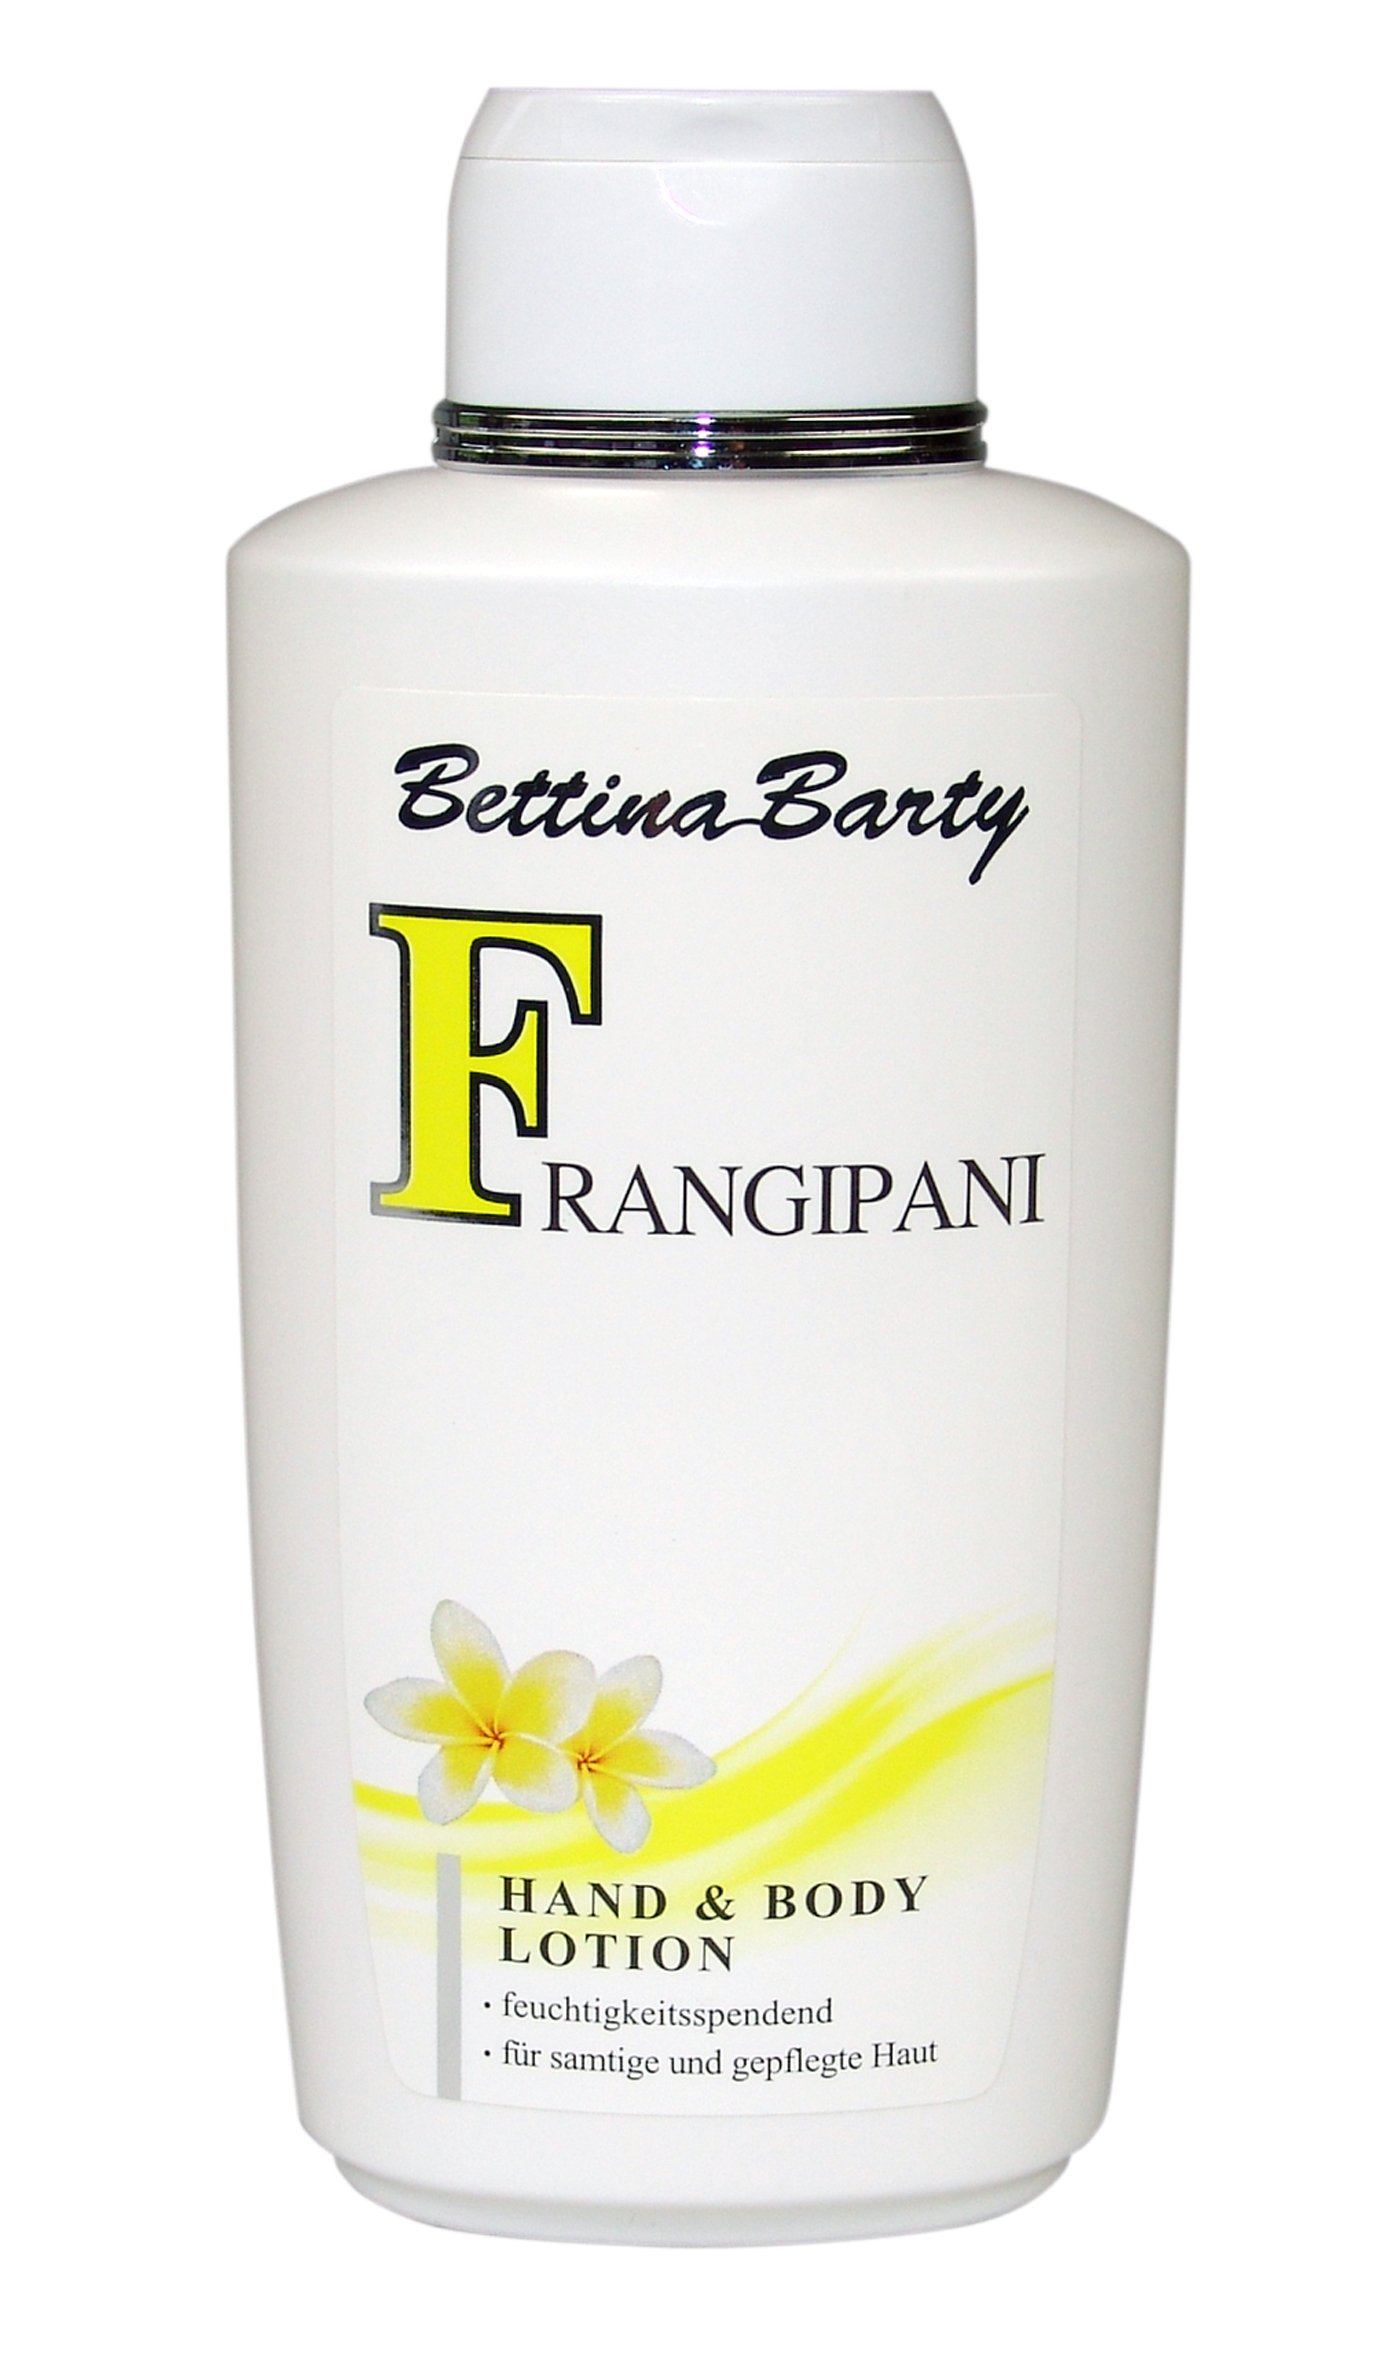 Bettina Barty Frangipani Hand & Body Lotion 500 ml